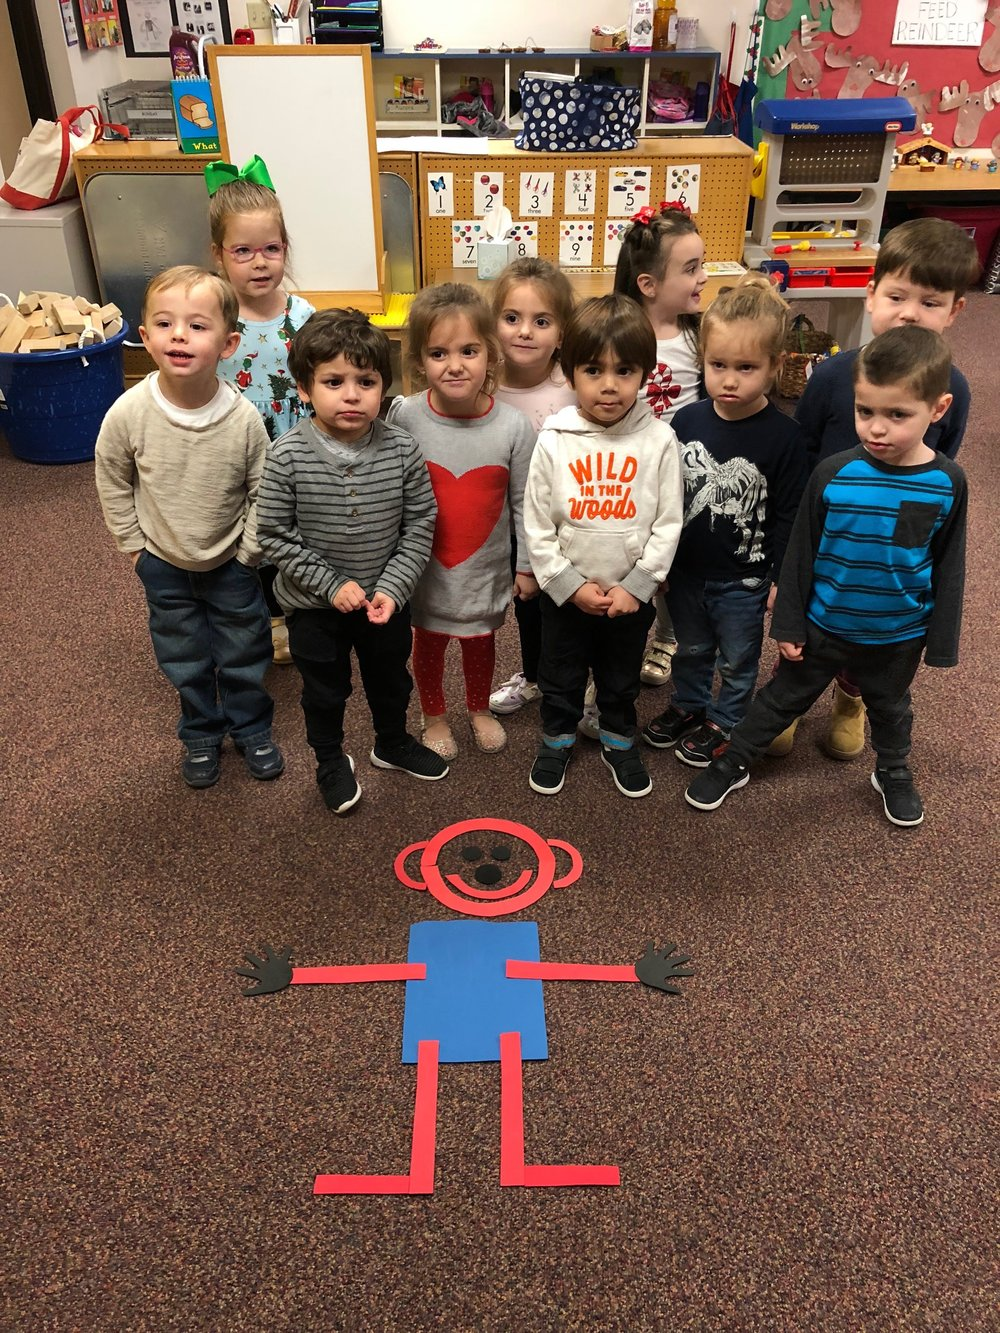 Mat Man at La Casa Preschool In Scottsdale